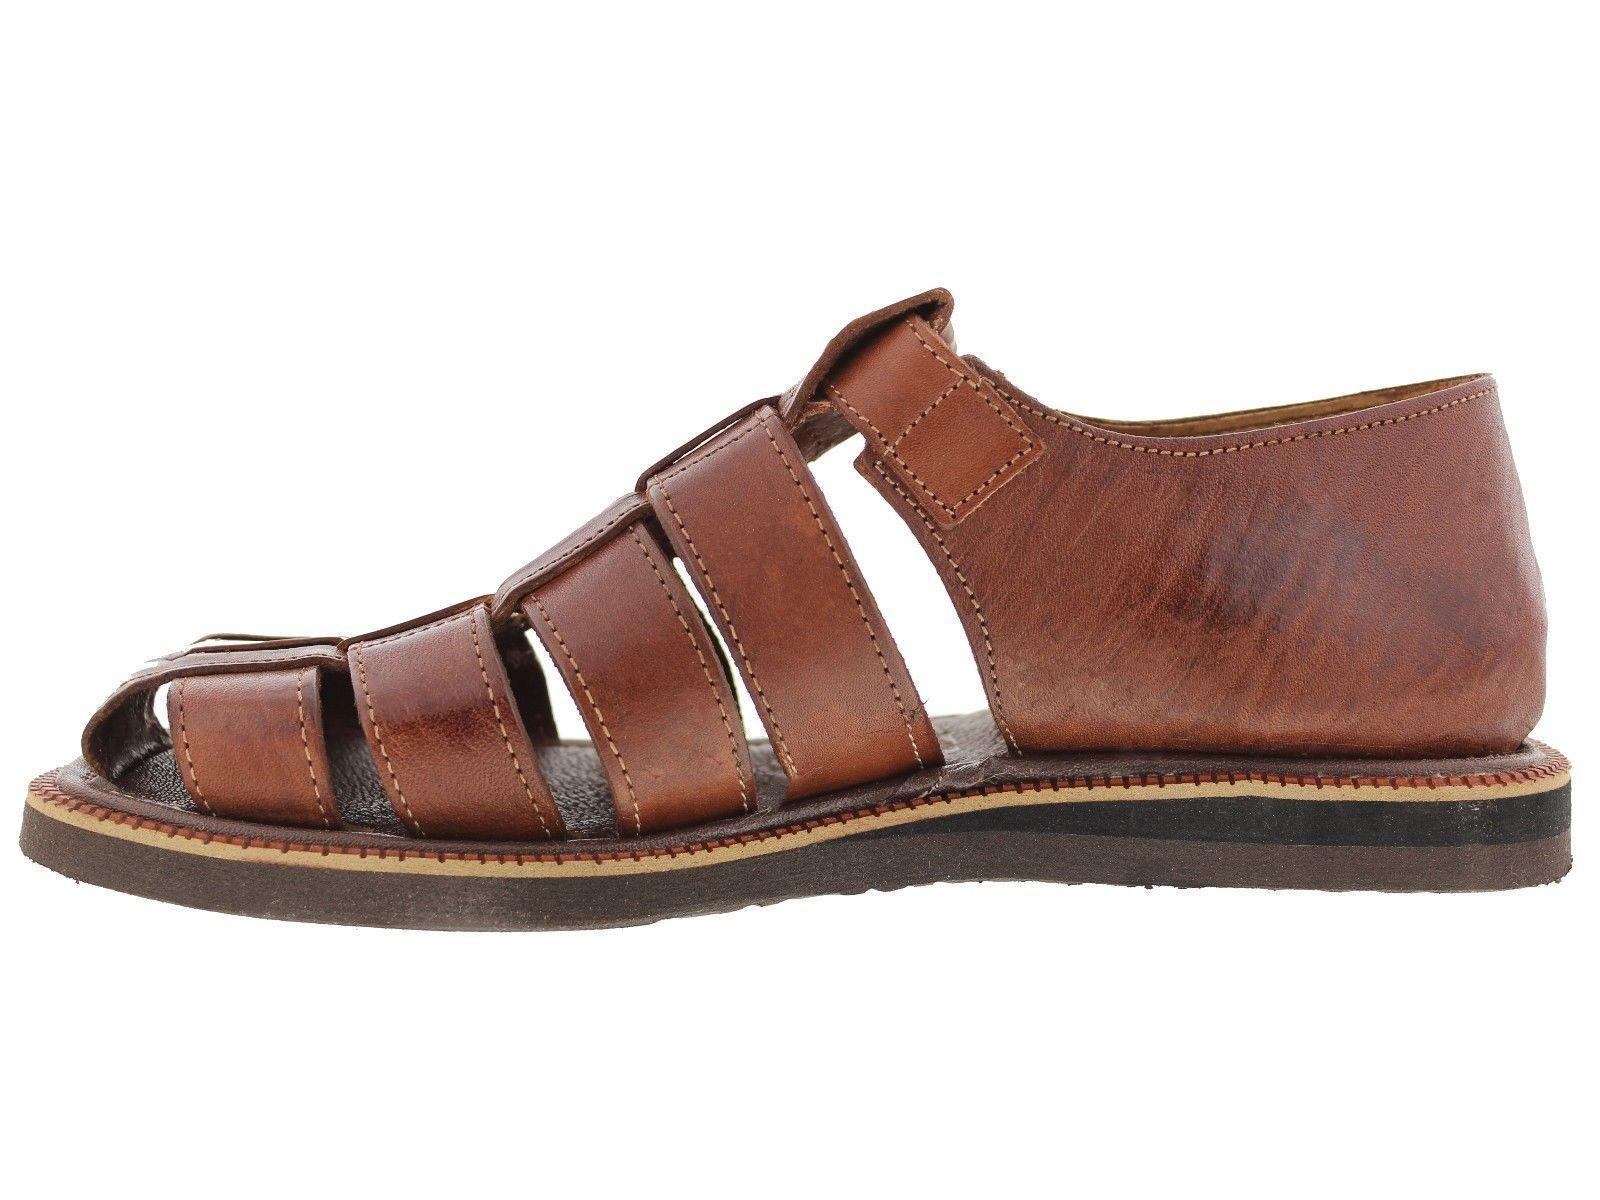 Mens Brown Genuine Leather Handmade Sandals Mexican Original Slip On Slides